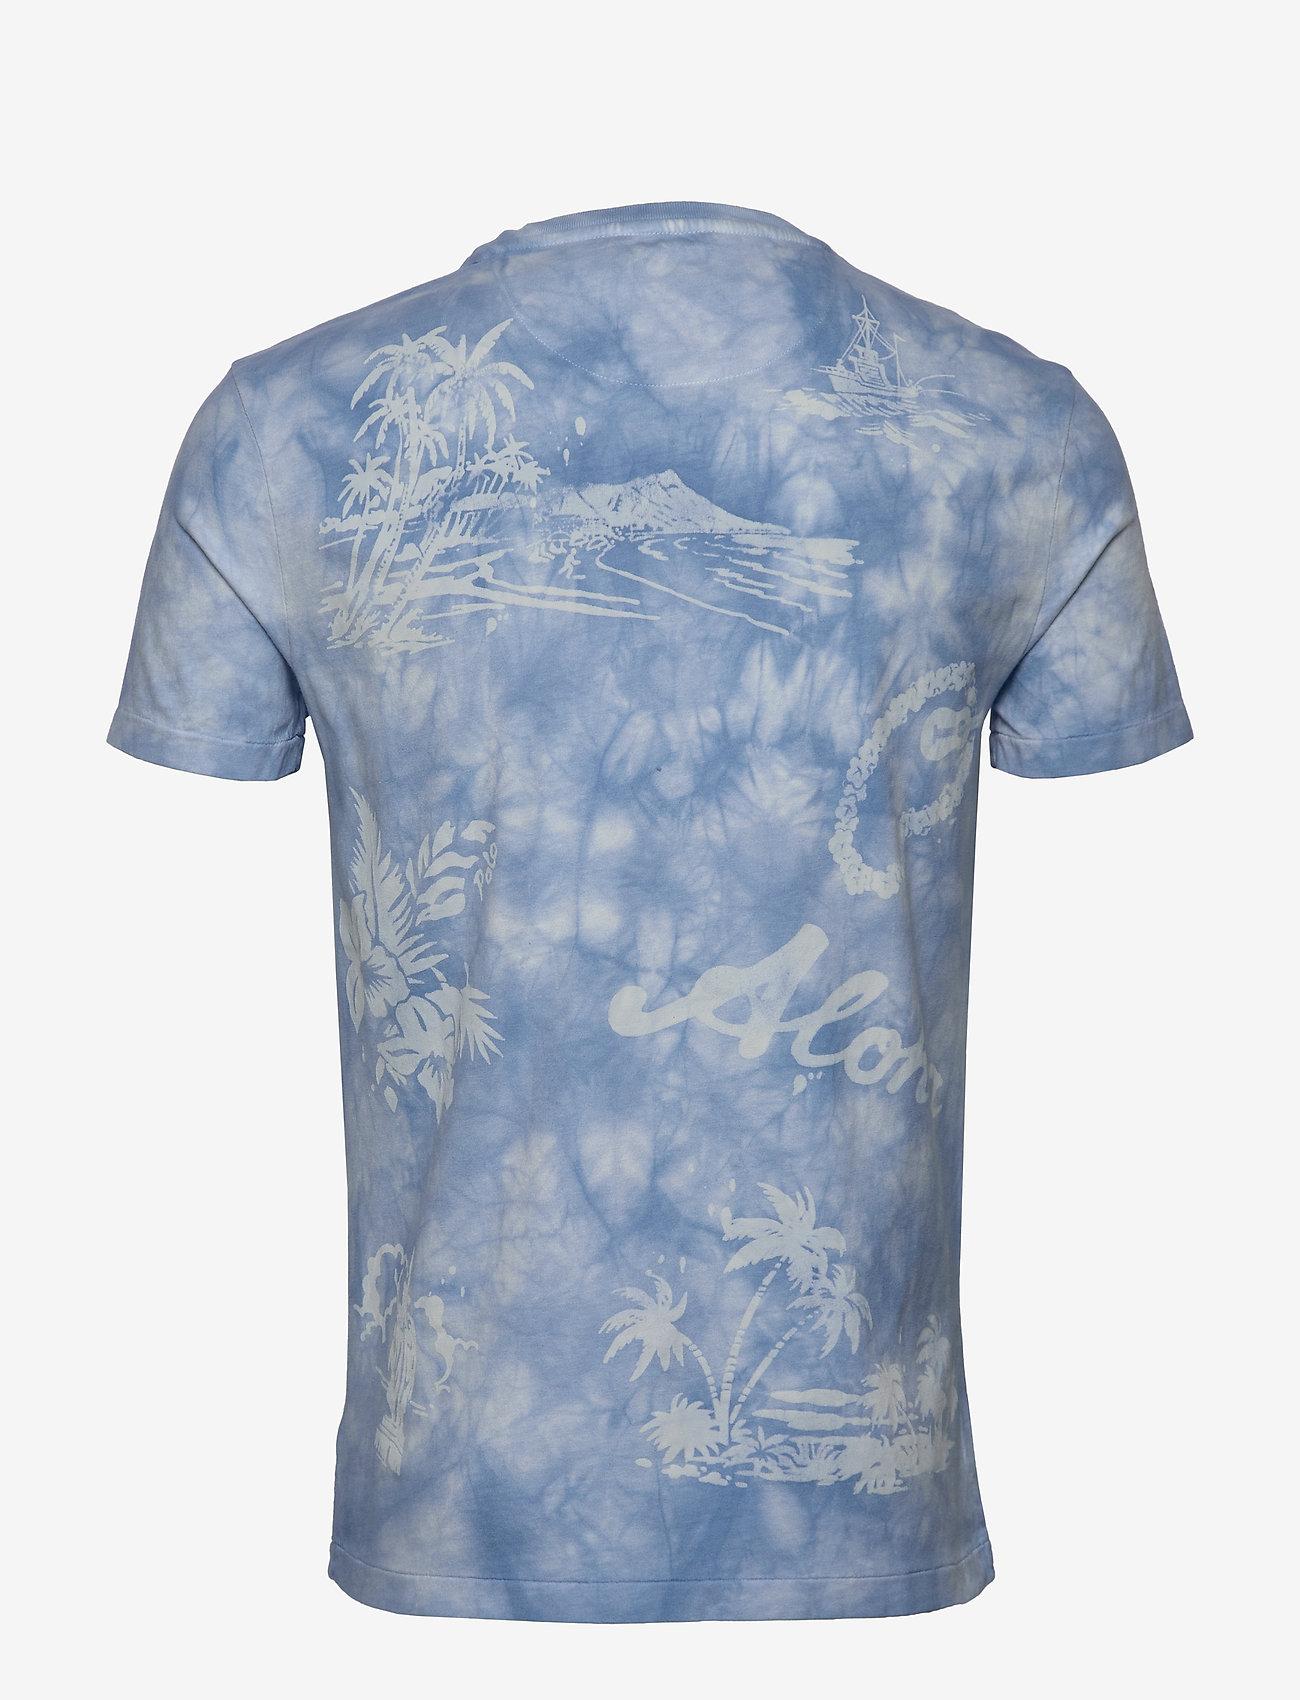 26/1 Jersey-ssl-tsh (French Blue Print) (79 €) - Polo Ralph Lauren rcUgQ7Mw